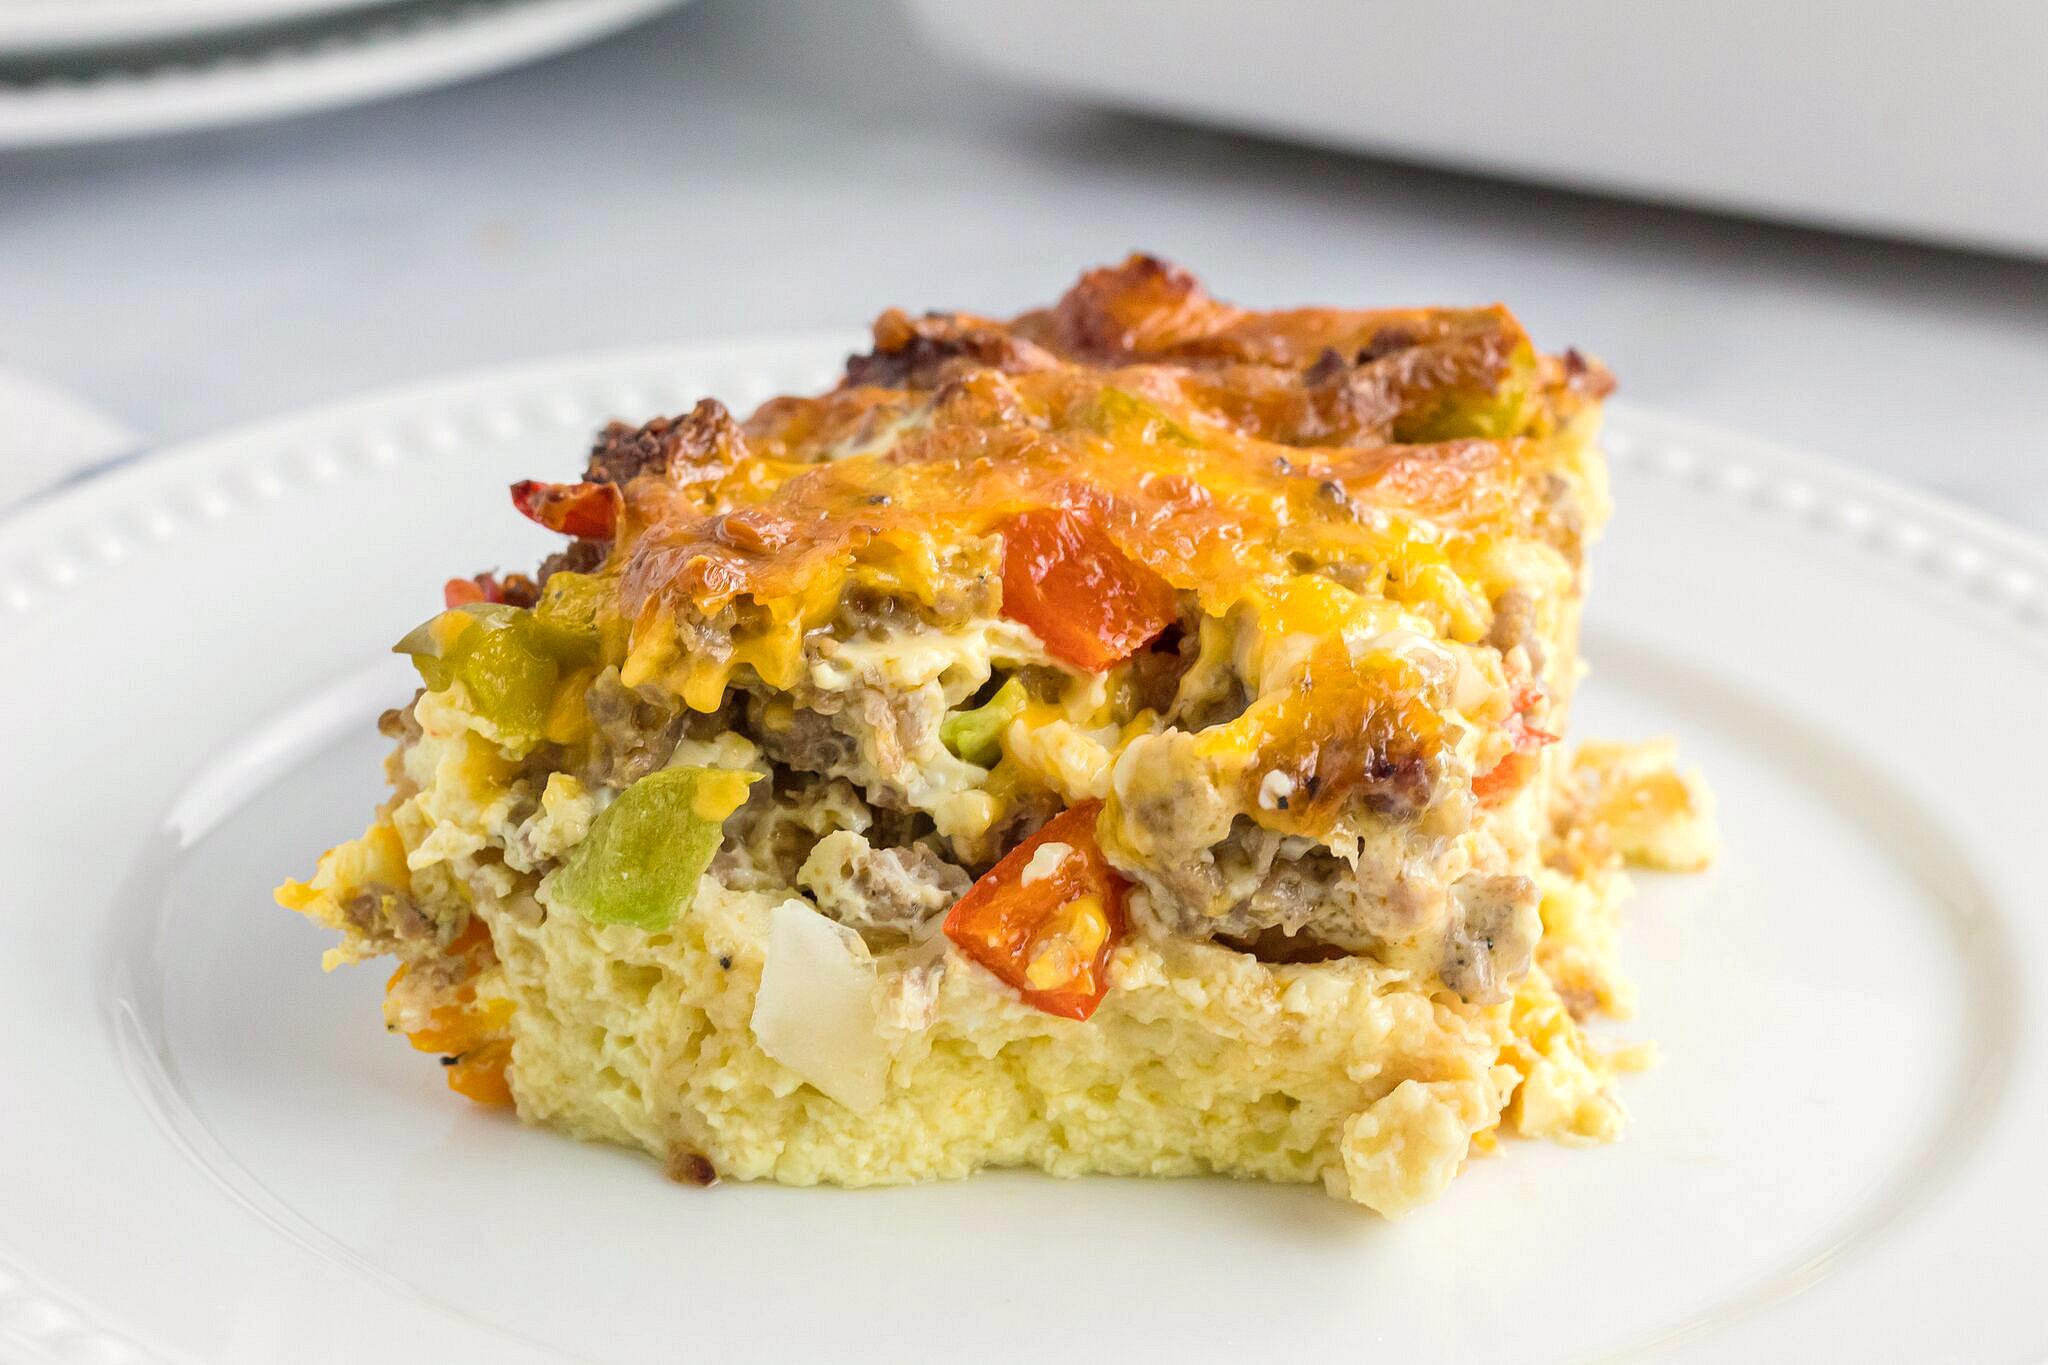 sausage egg casserole